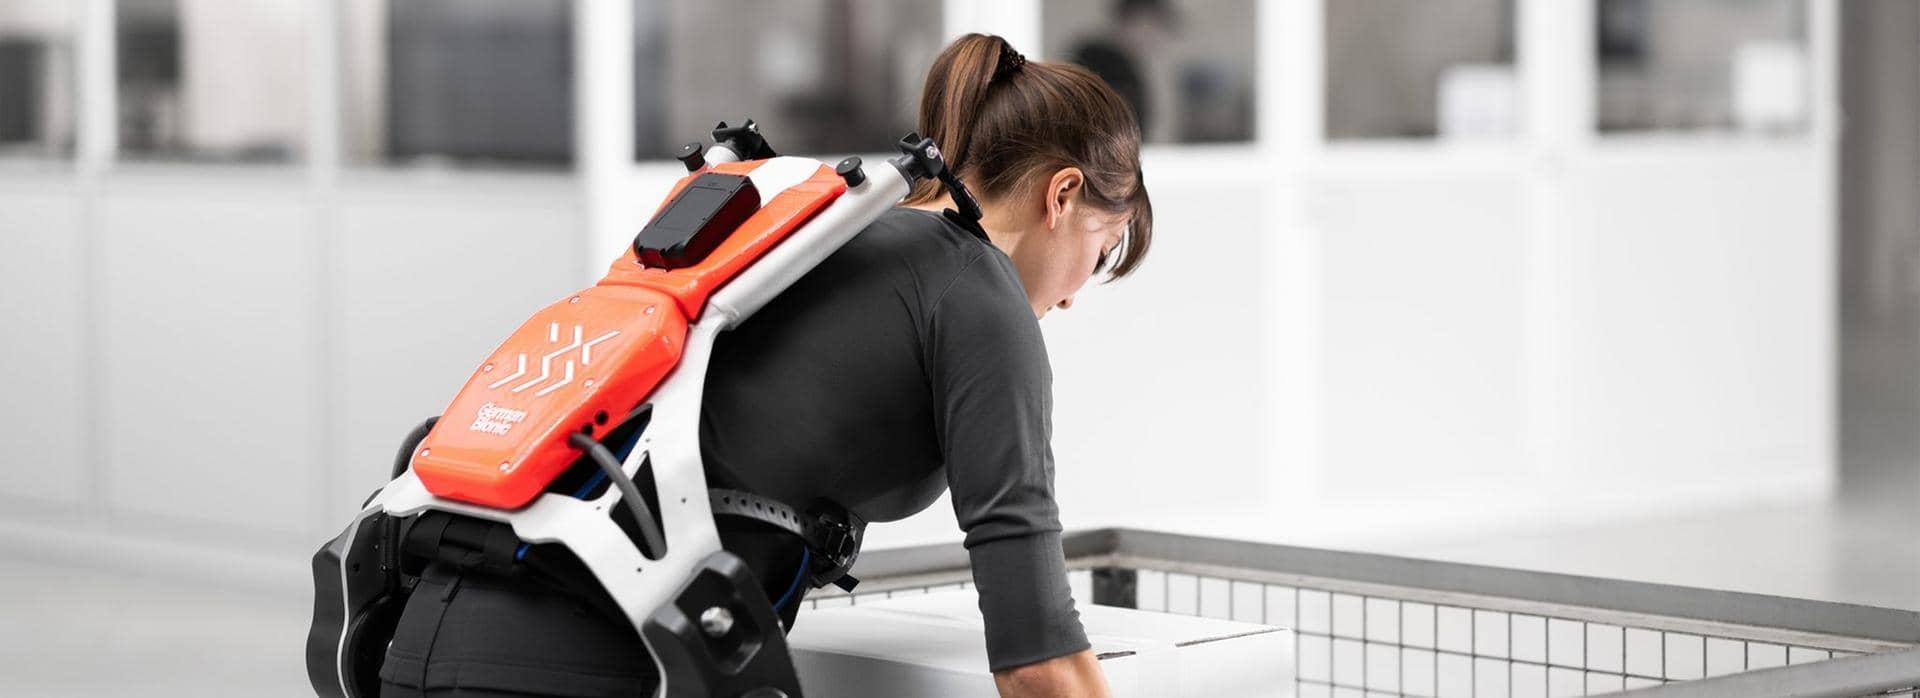 DB Schenker Exoskeletons woman lifting